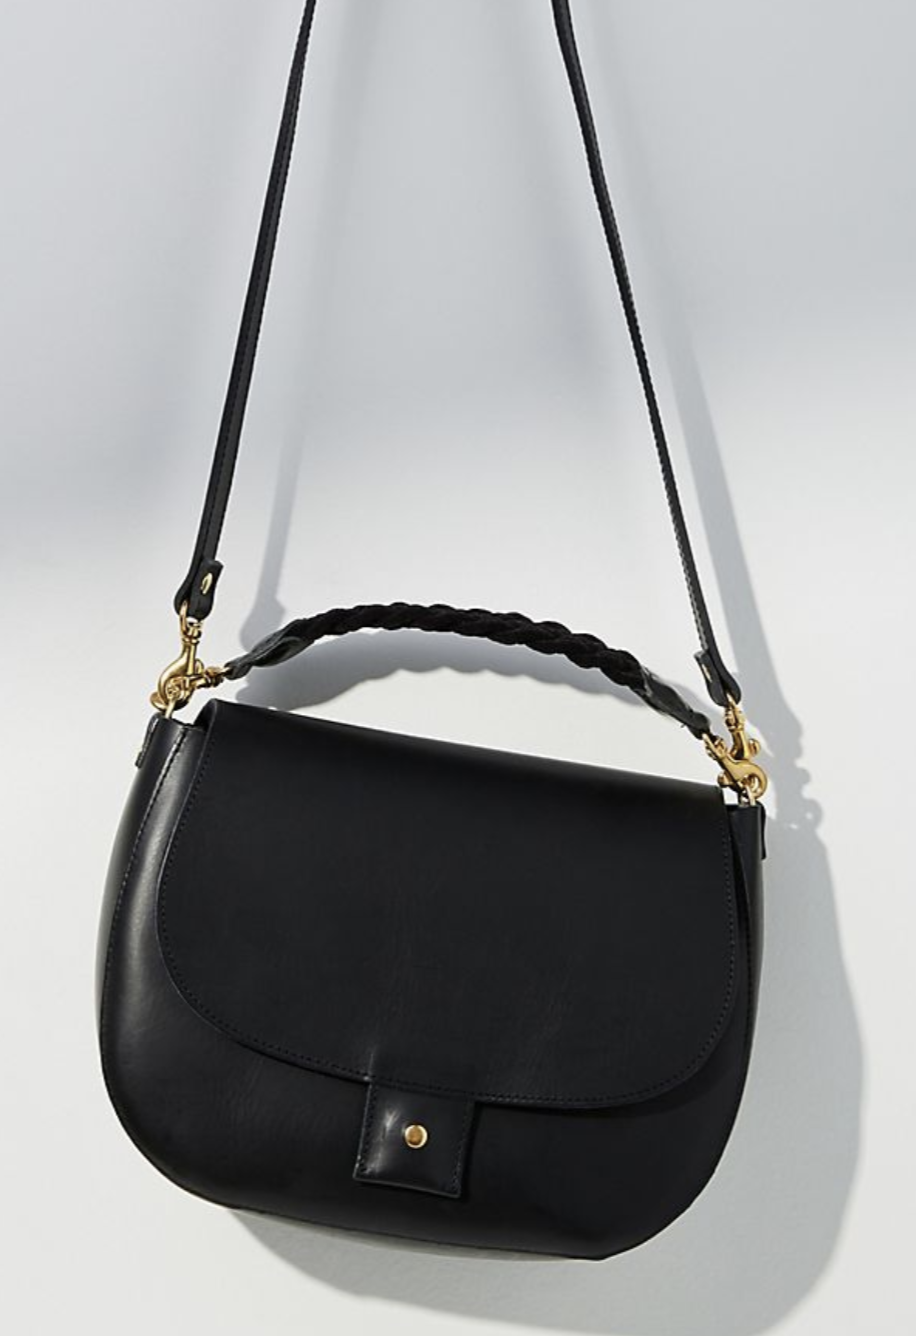 Clare V Herieth Bag ($378)